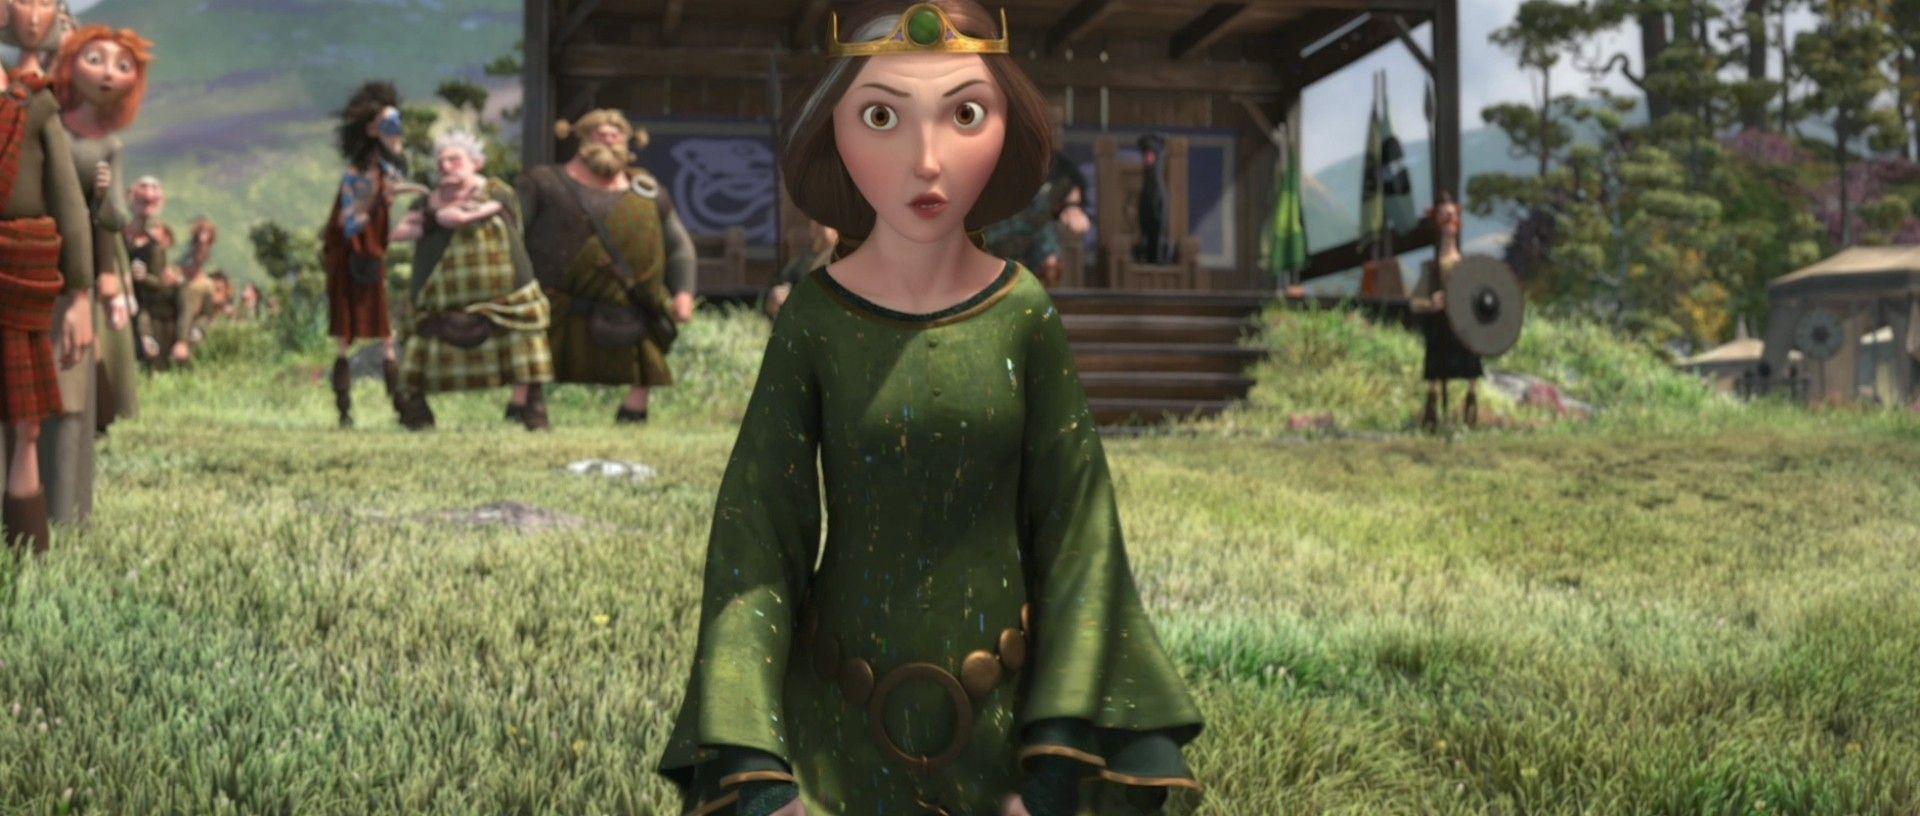 Queen Elinor (Emma Thompson) - Brave (2012)